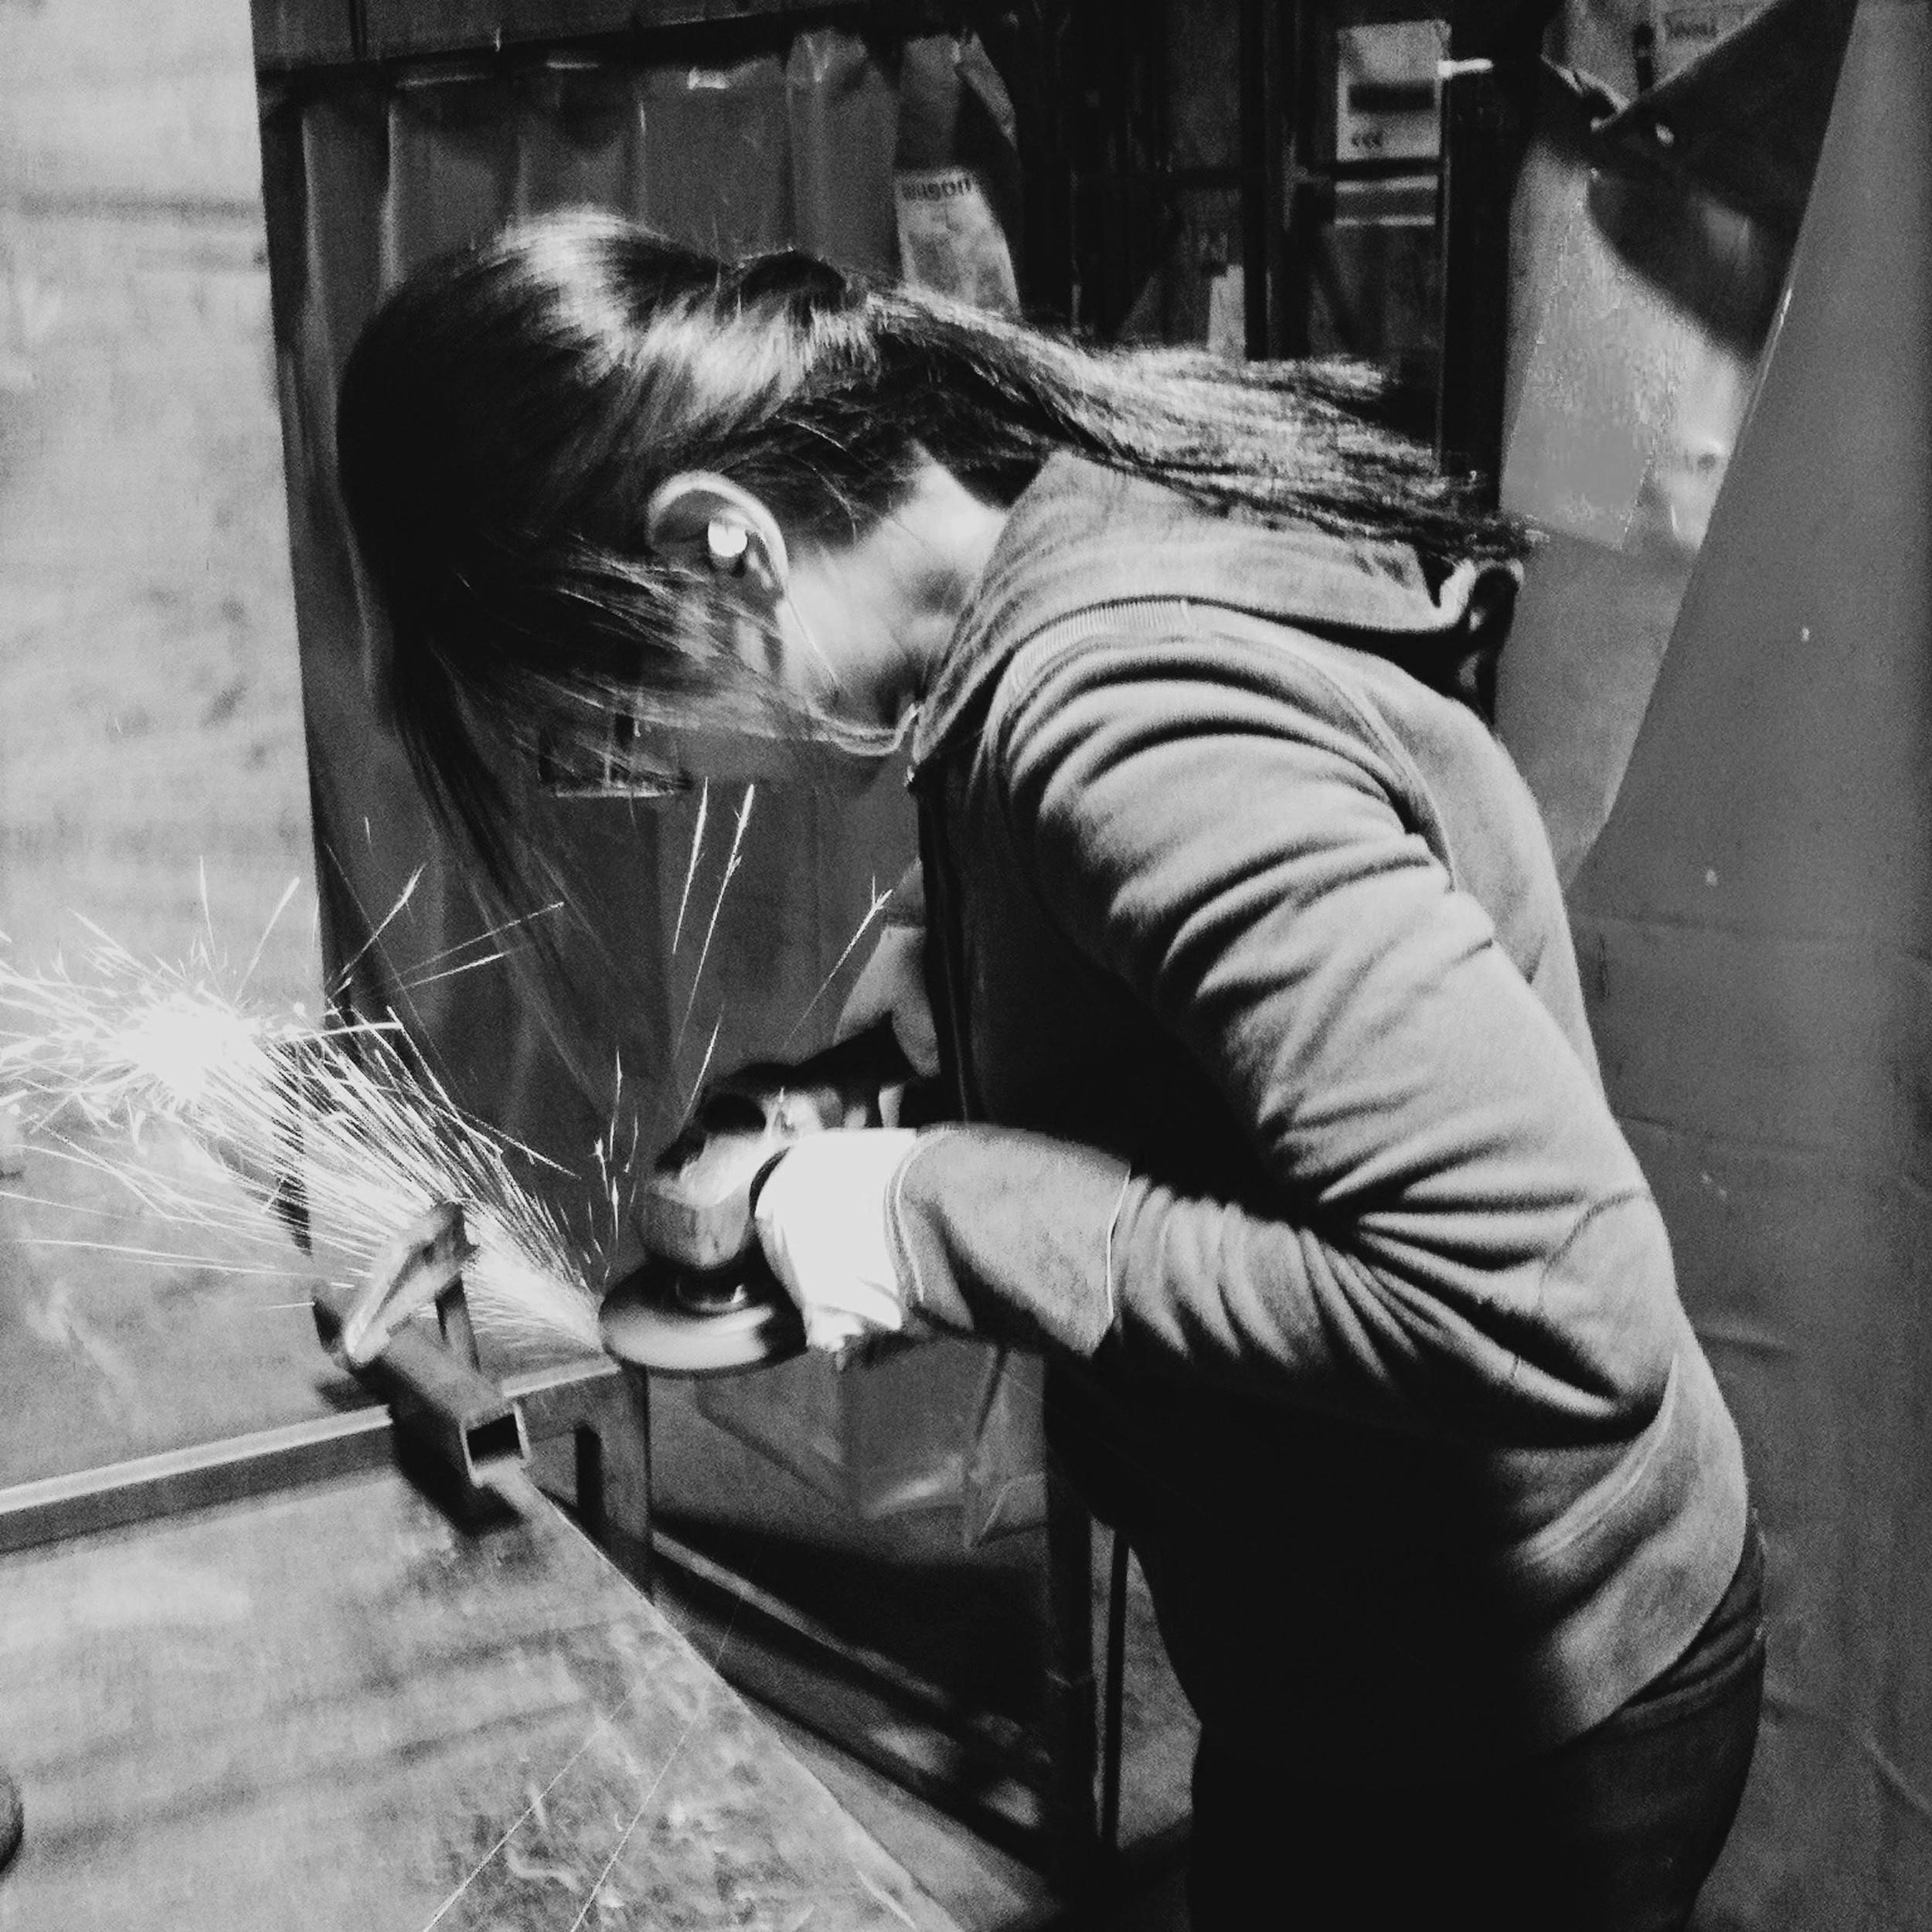 Evangeline Pesigan working on the Latag